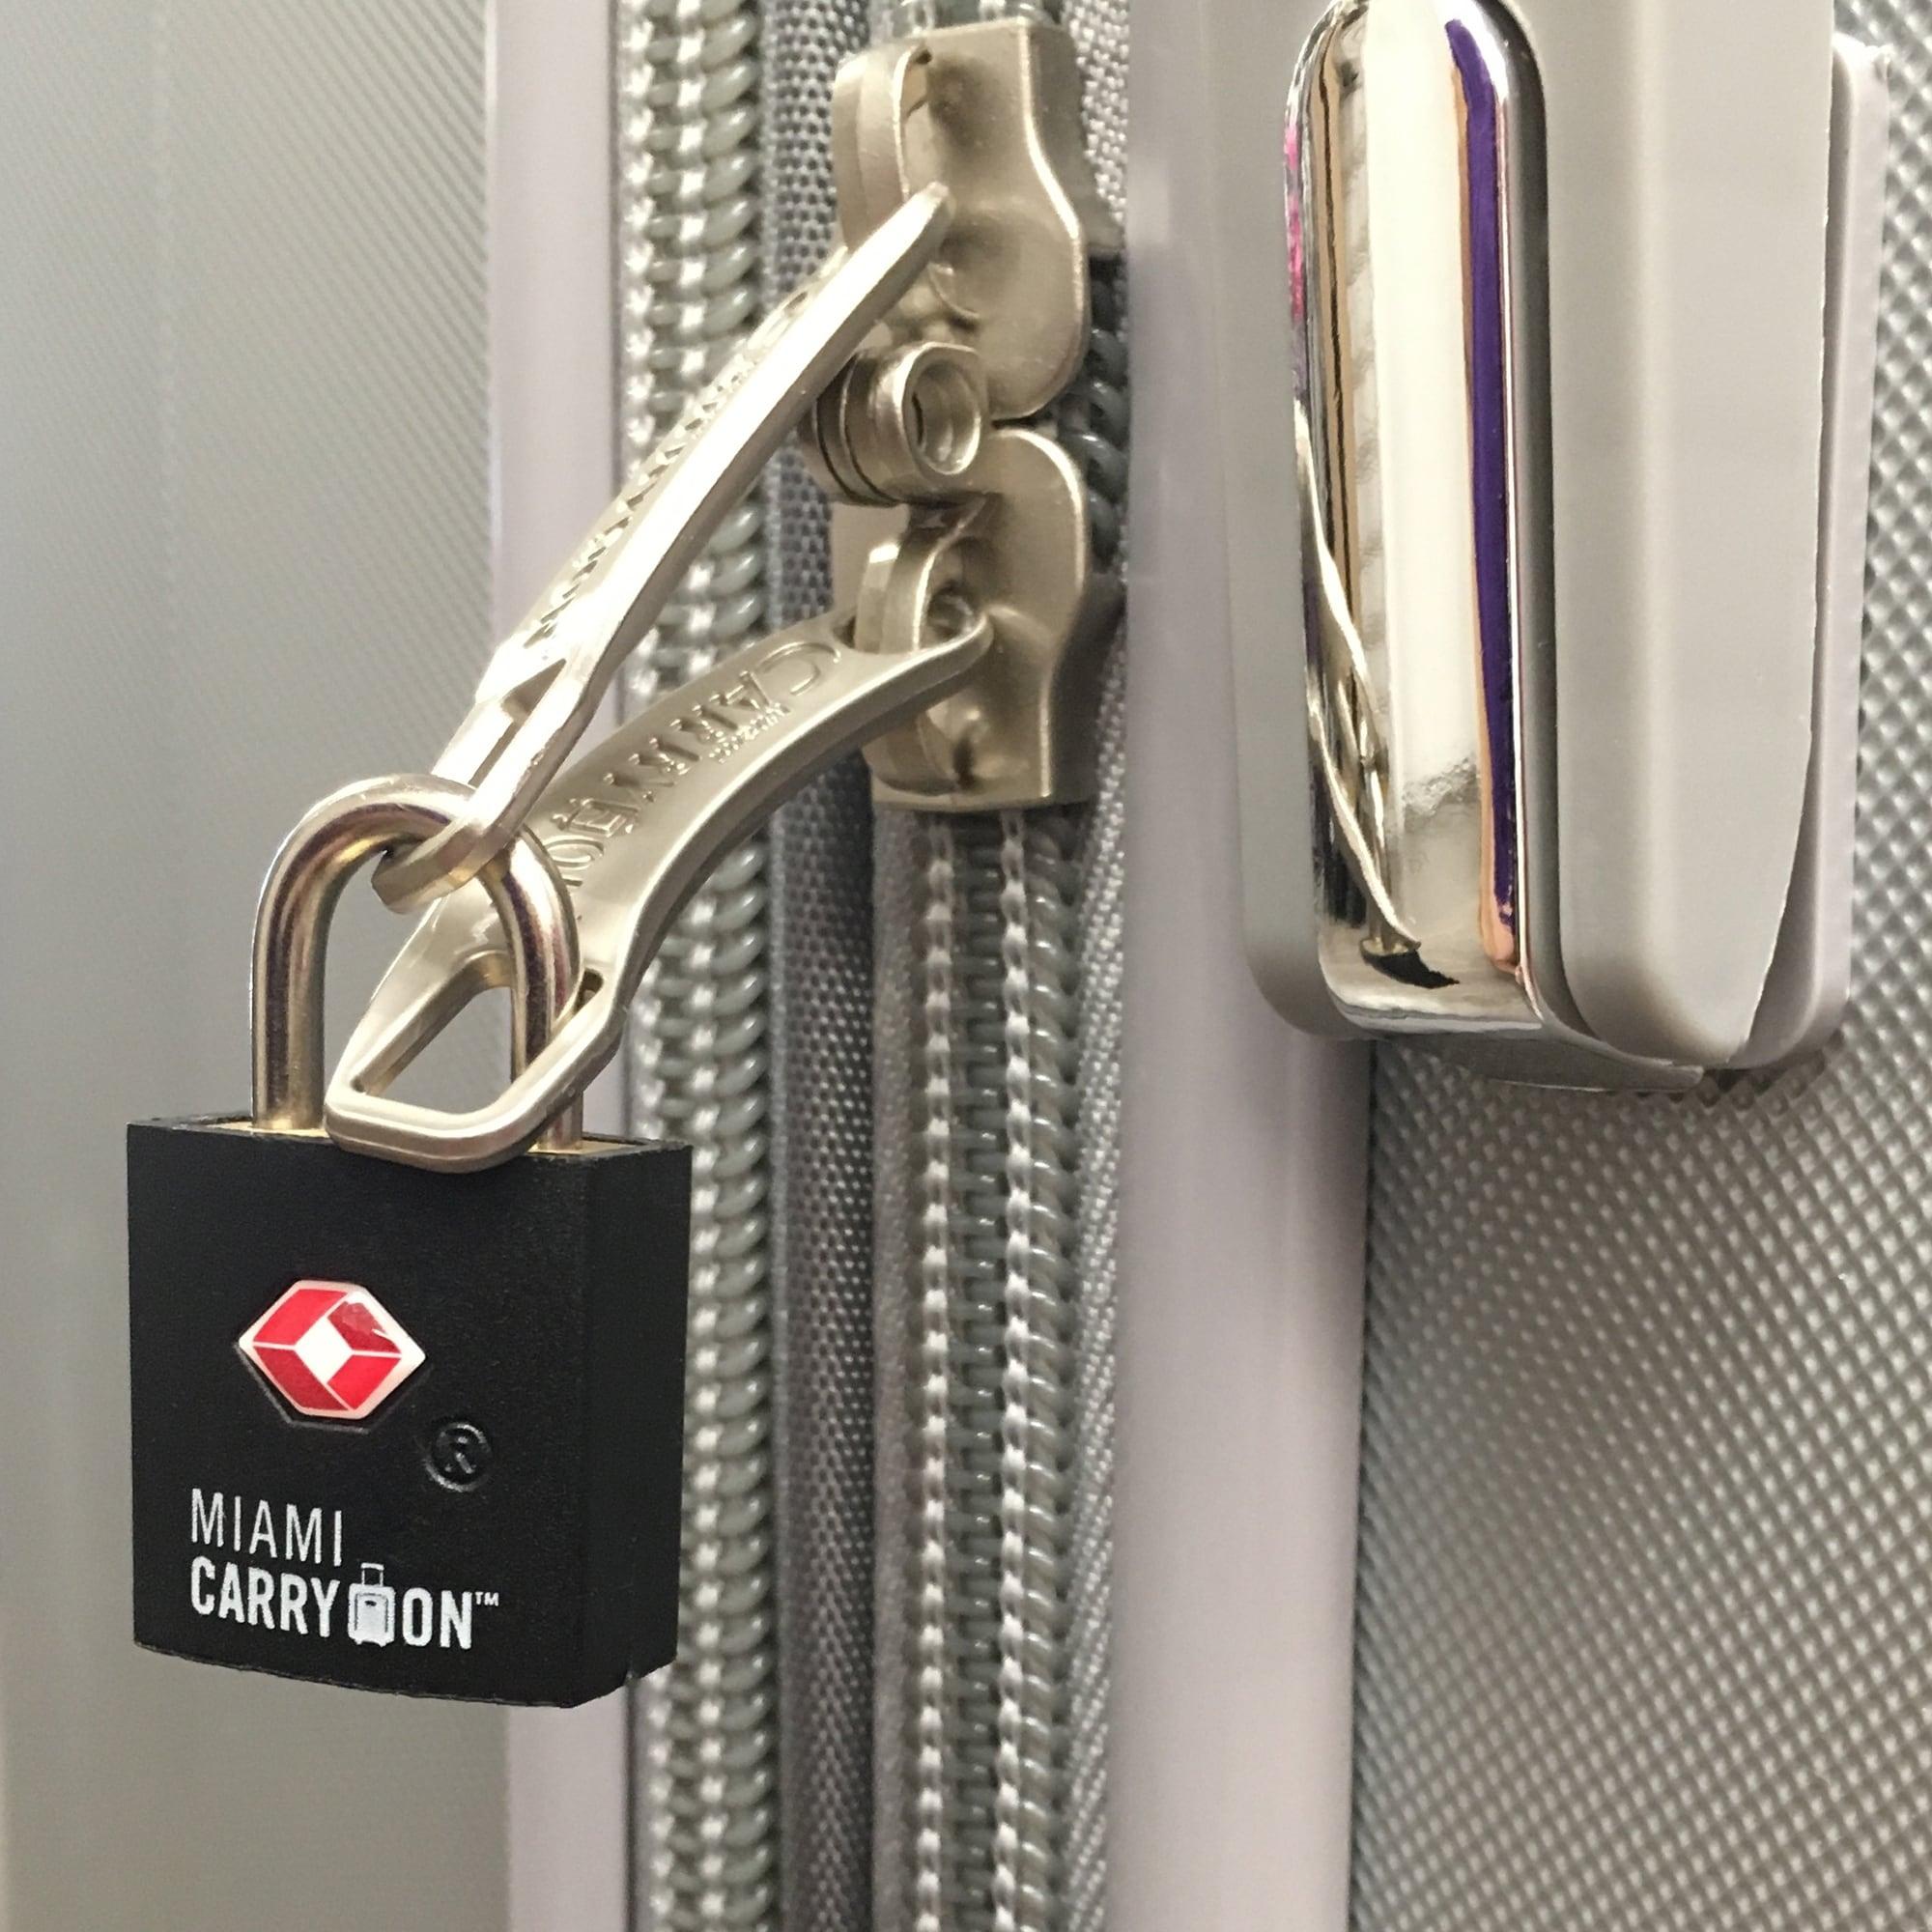 e30fac0c4f4f Miami CarryOn TSA Approved Padlock - Keyed Luggage Lock - 2 Pack